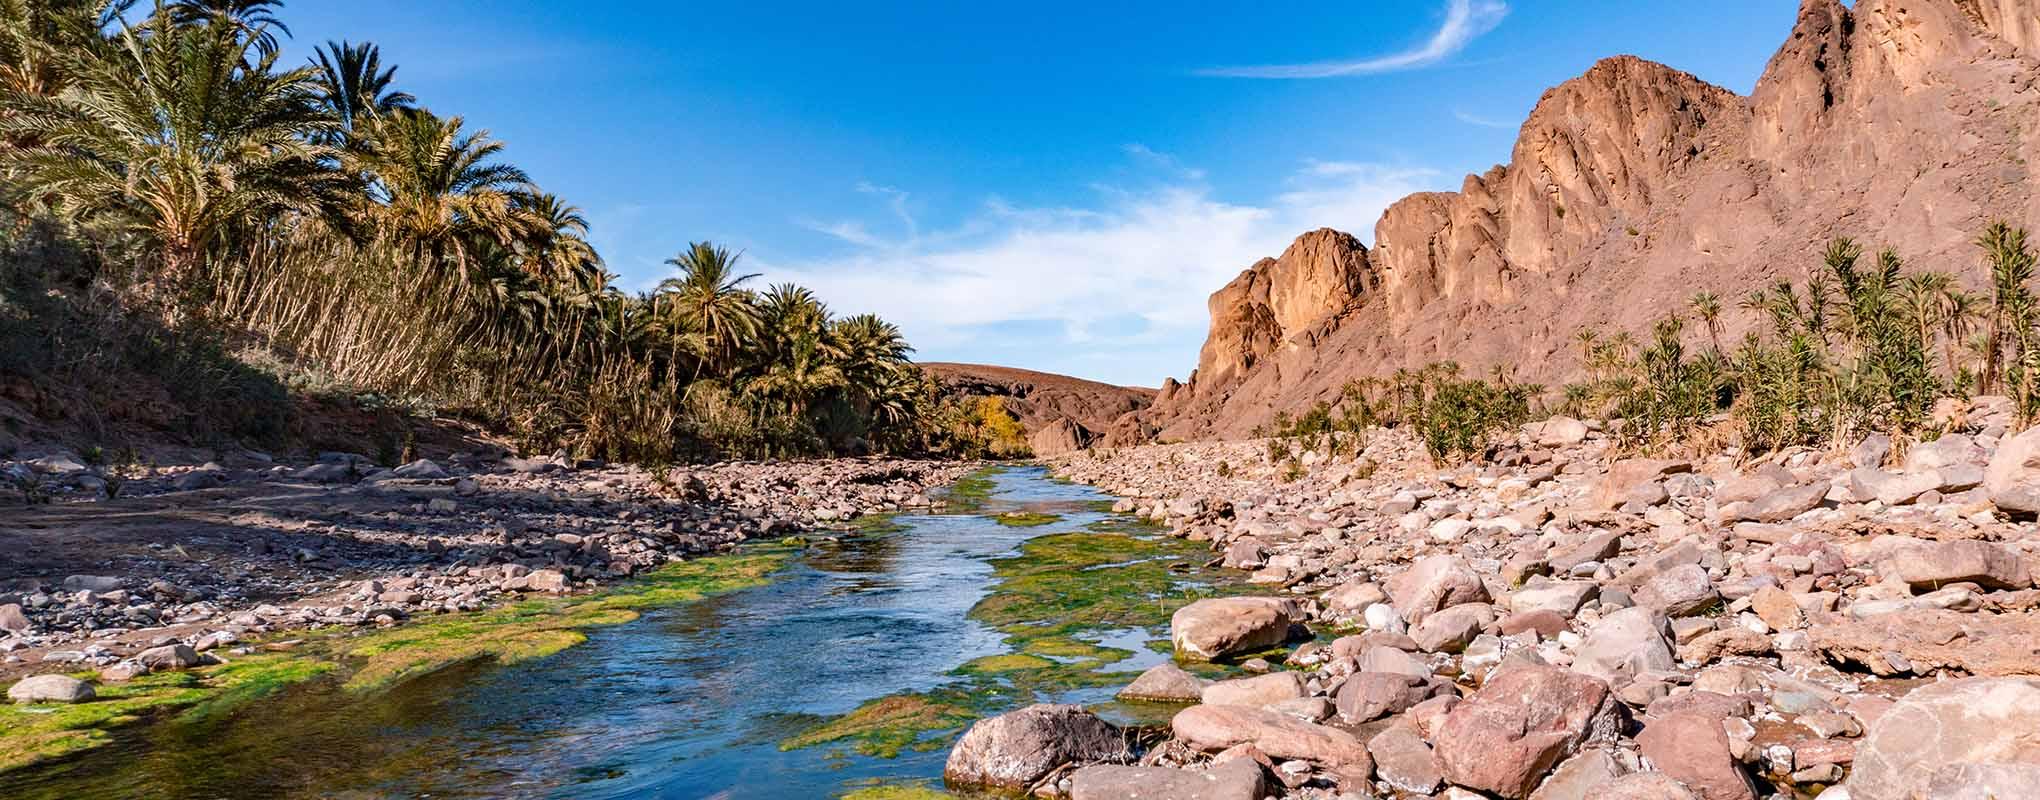 Oasis de Fint en Ouarzazate